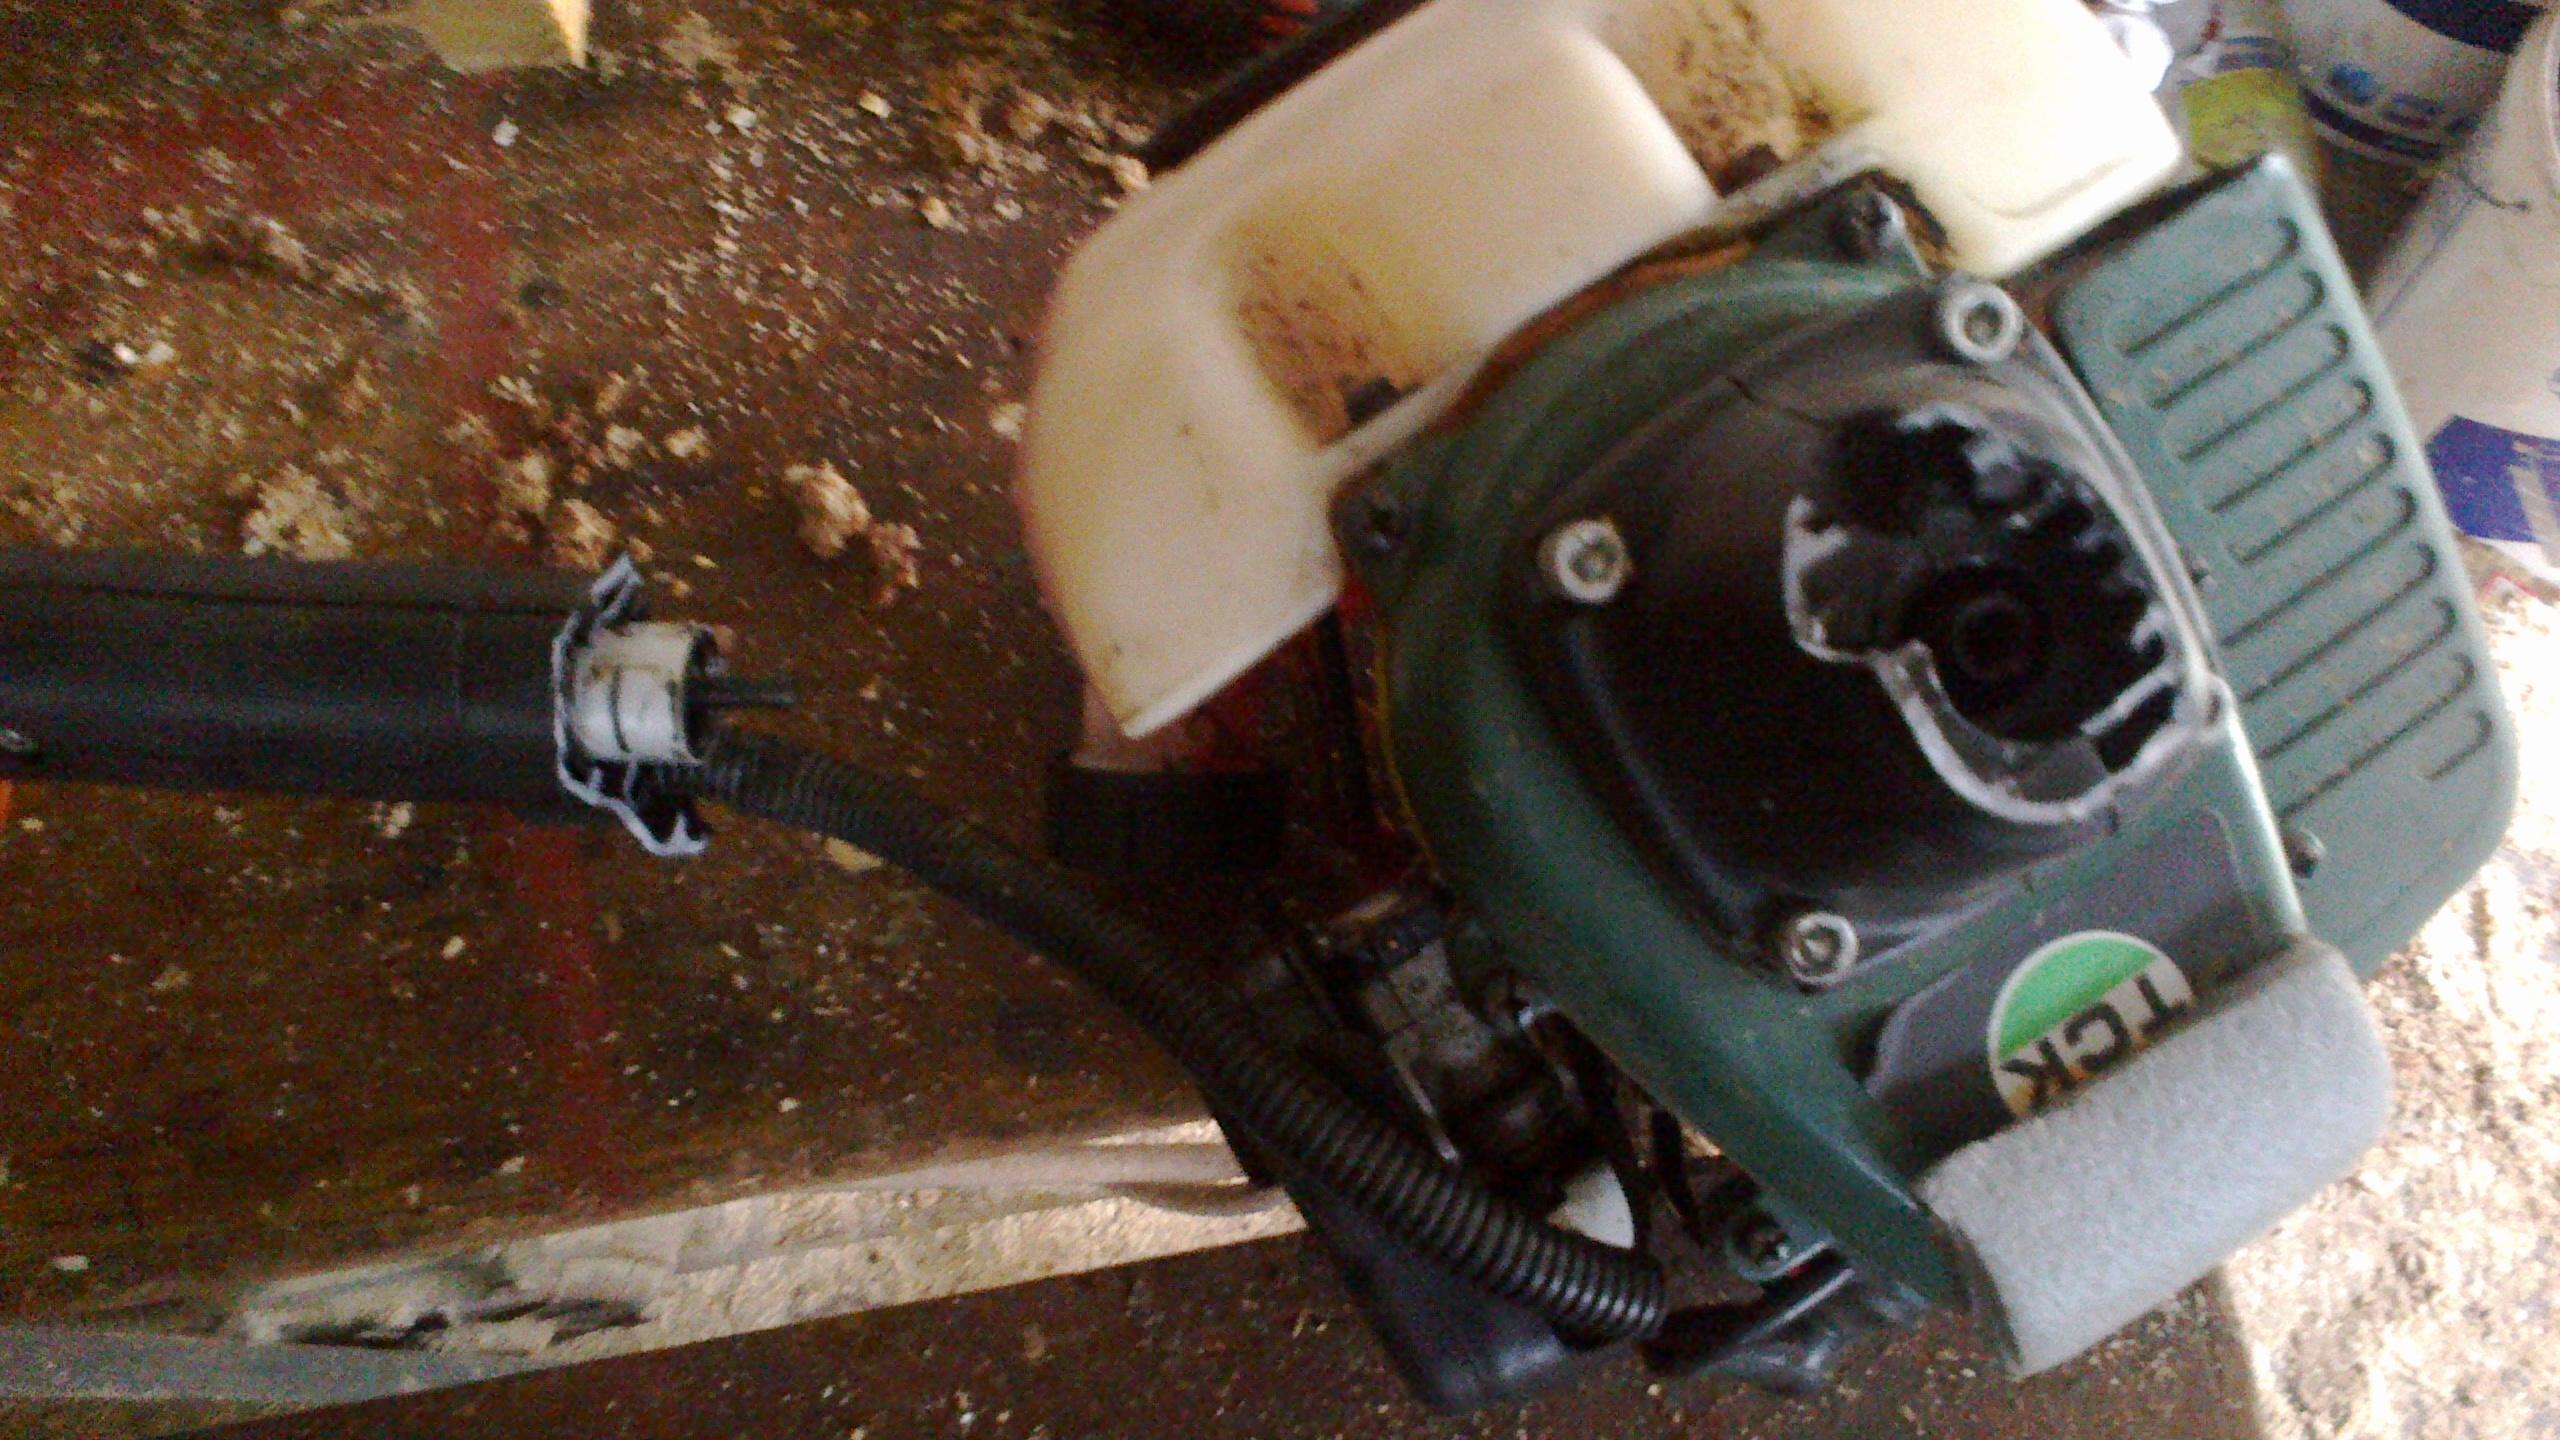 Ppodkaszarka TCK dcbt 2638 - uszkodzona obudowa sprz�g�a.